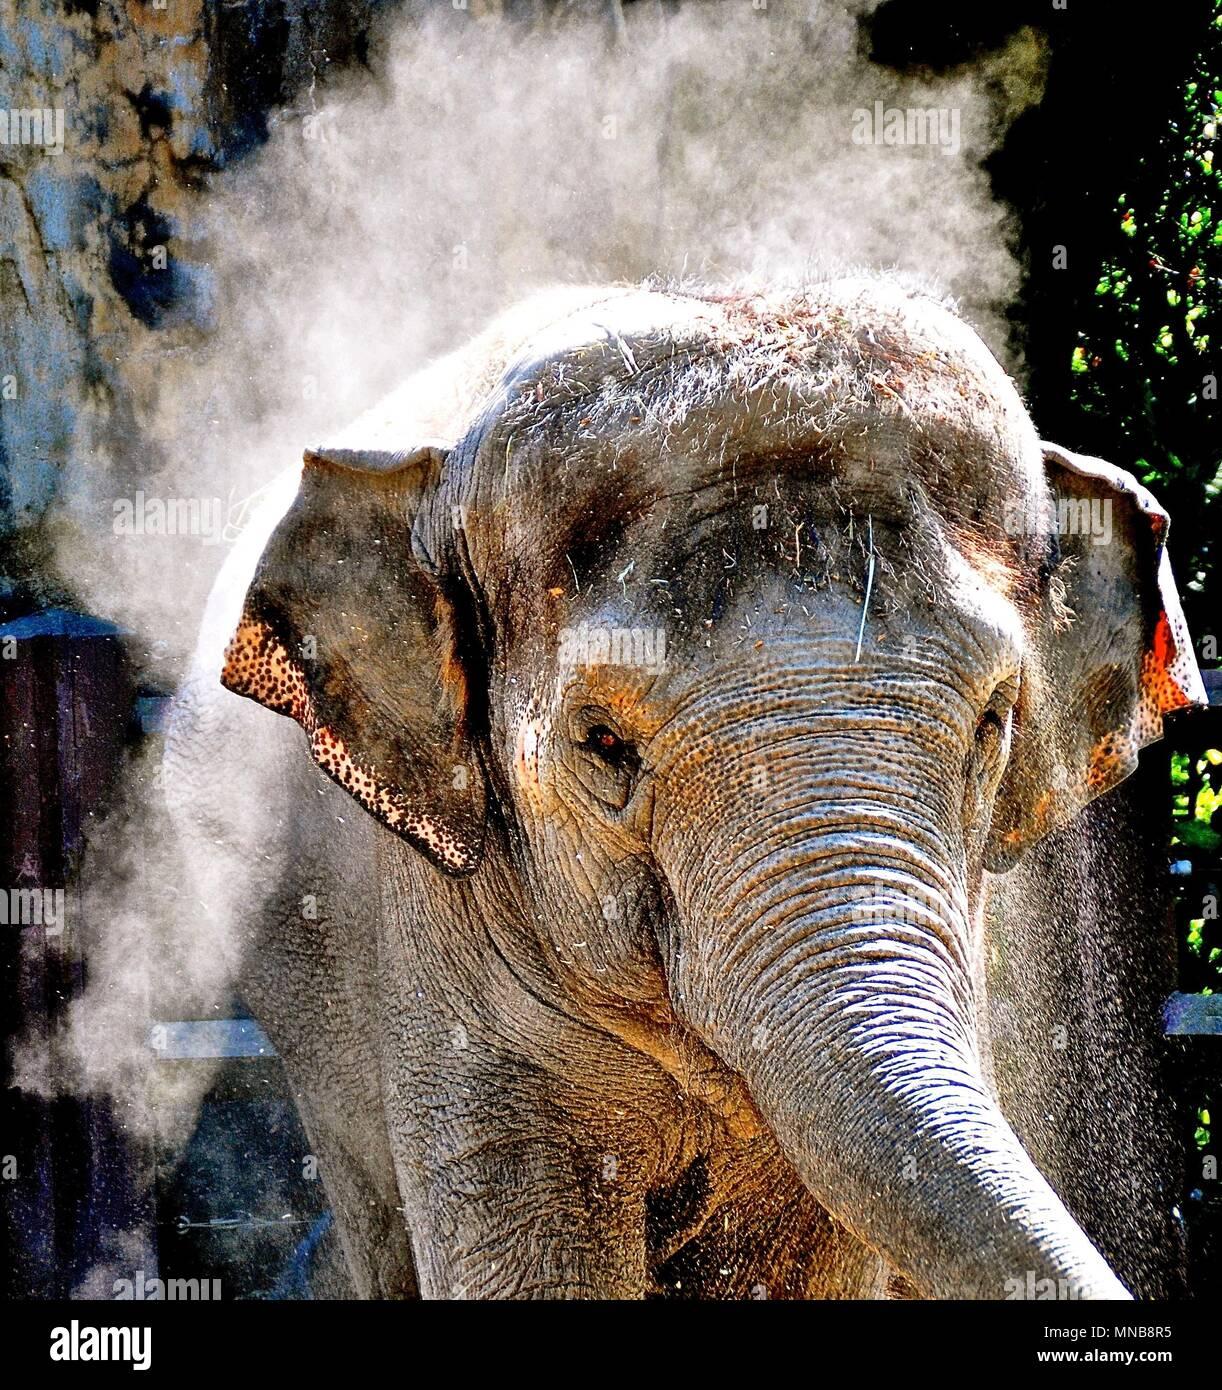 Elephant giving itself a dust bath - Stock Image